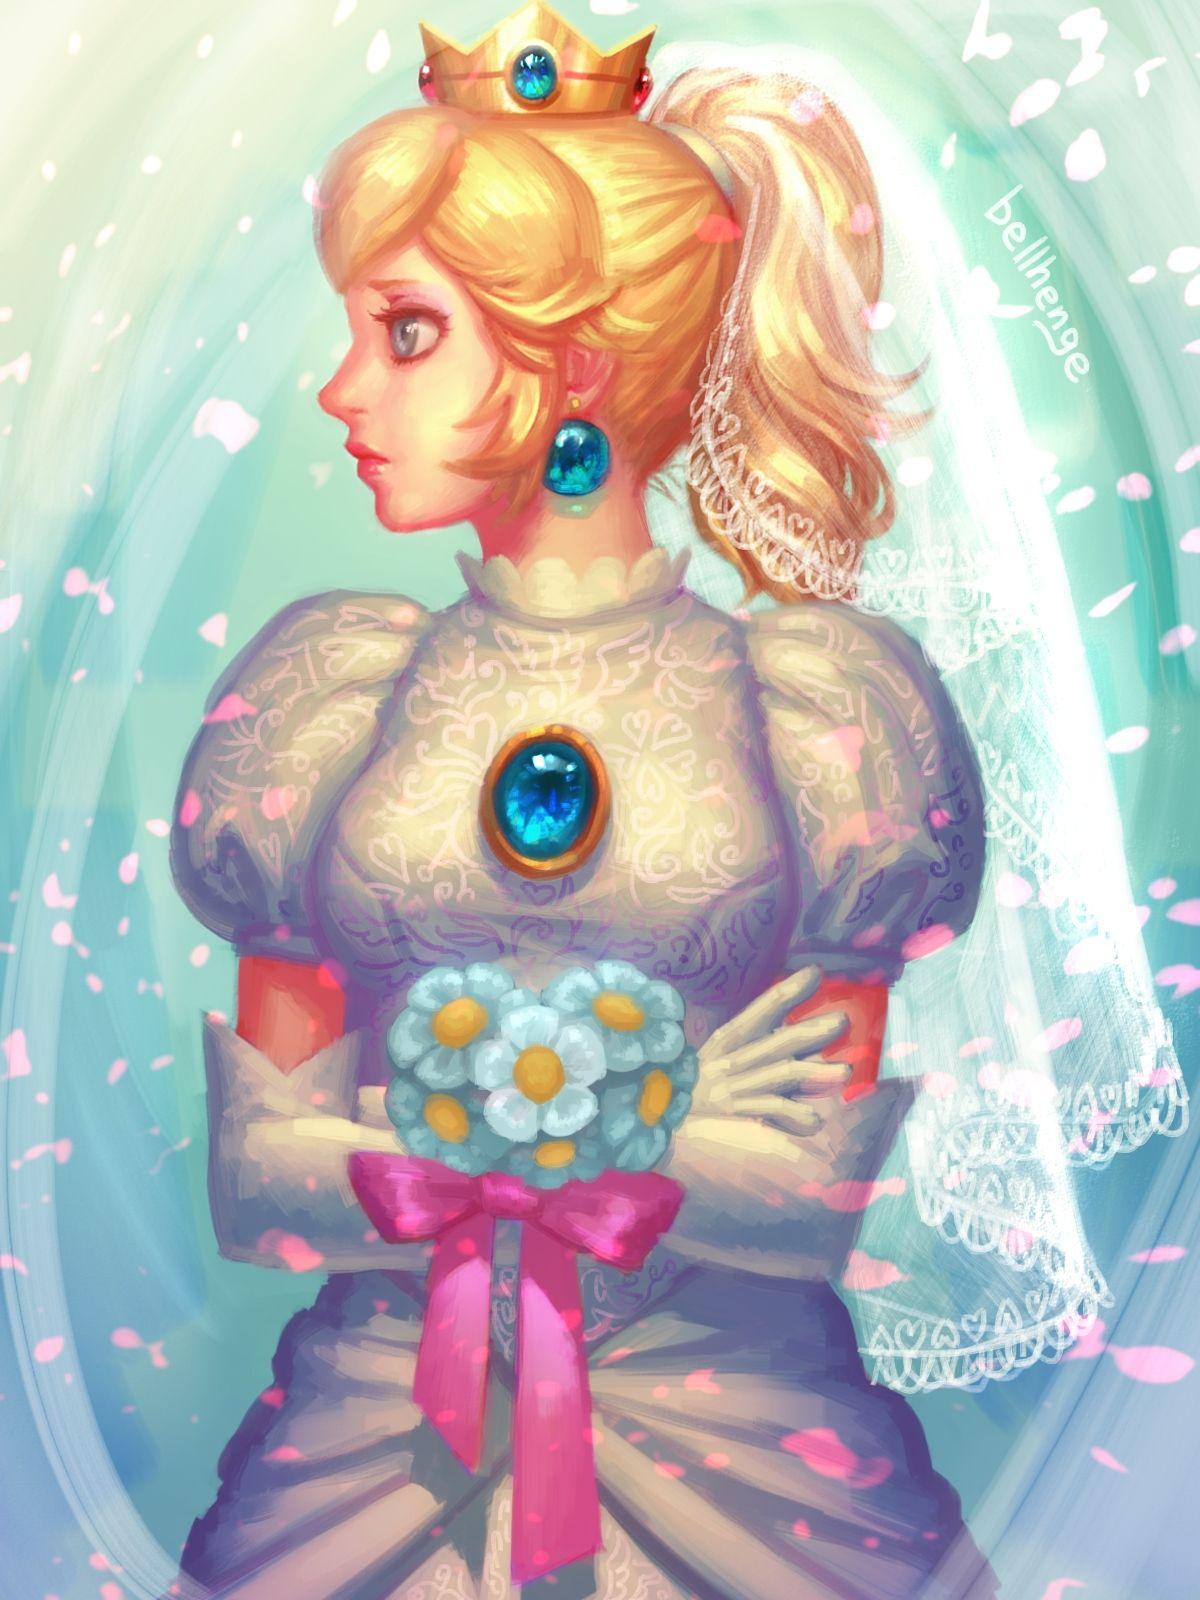 Wedding Peach by bellhenge.deviantart.com on @DeviantArt | Nintendo ...